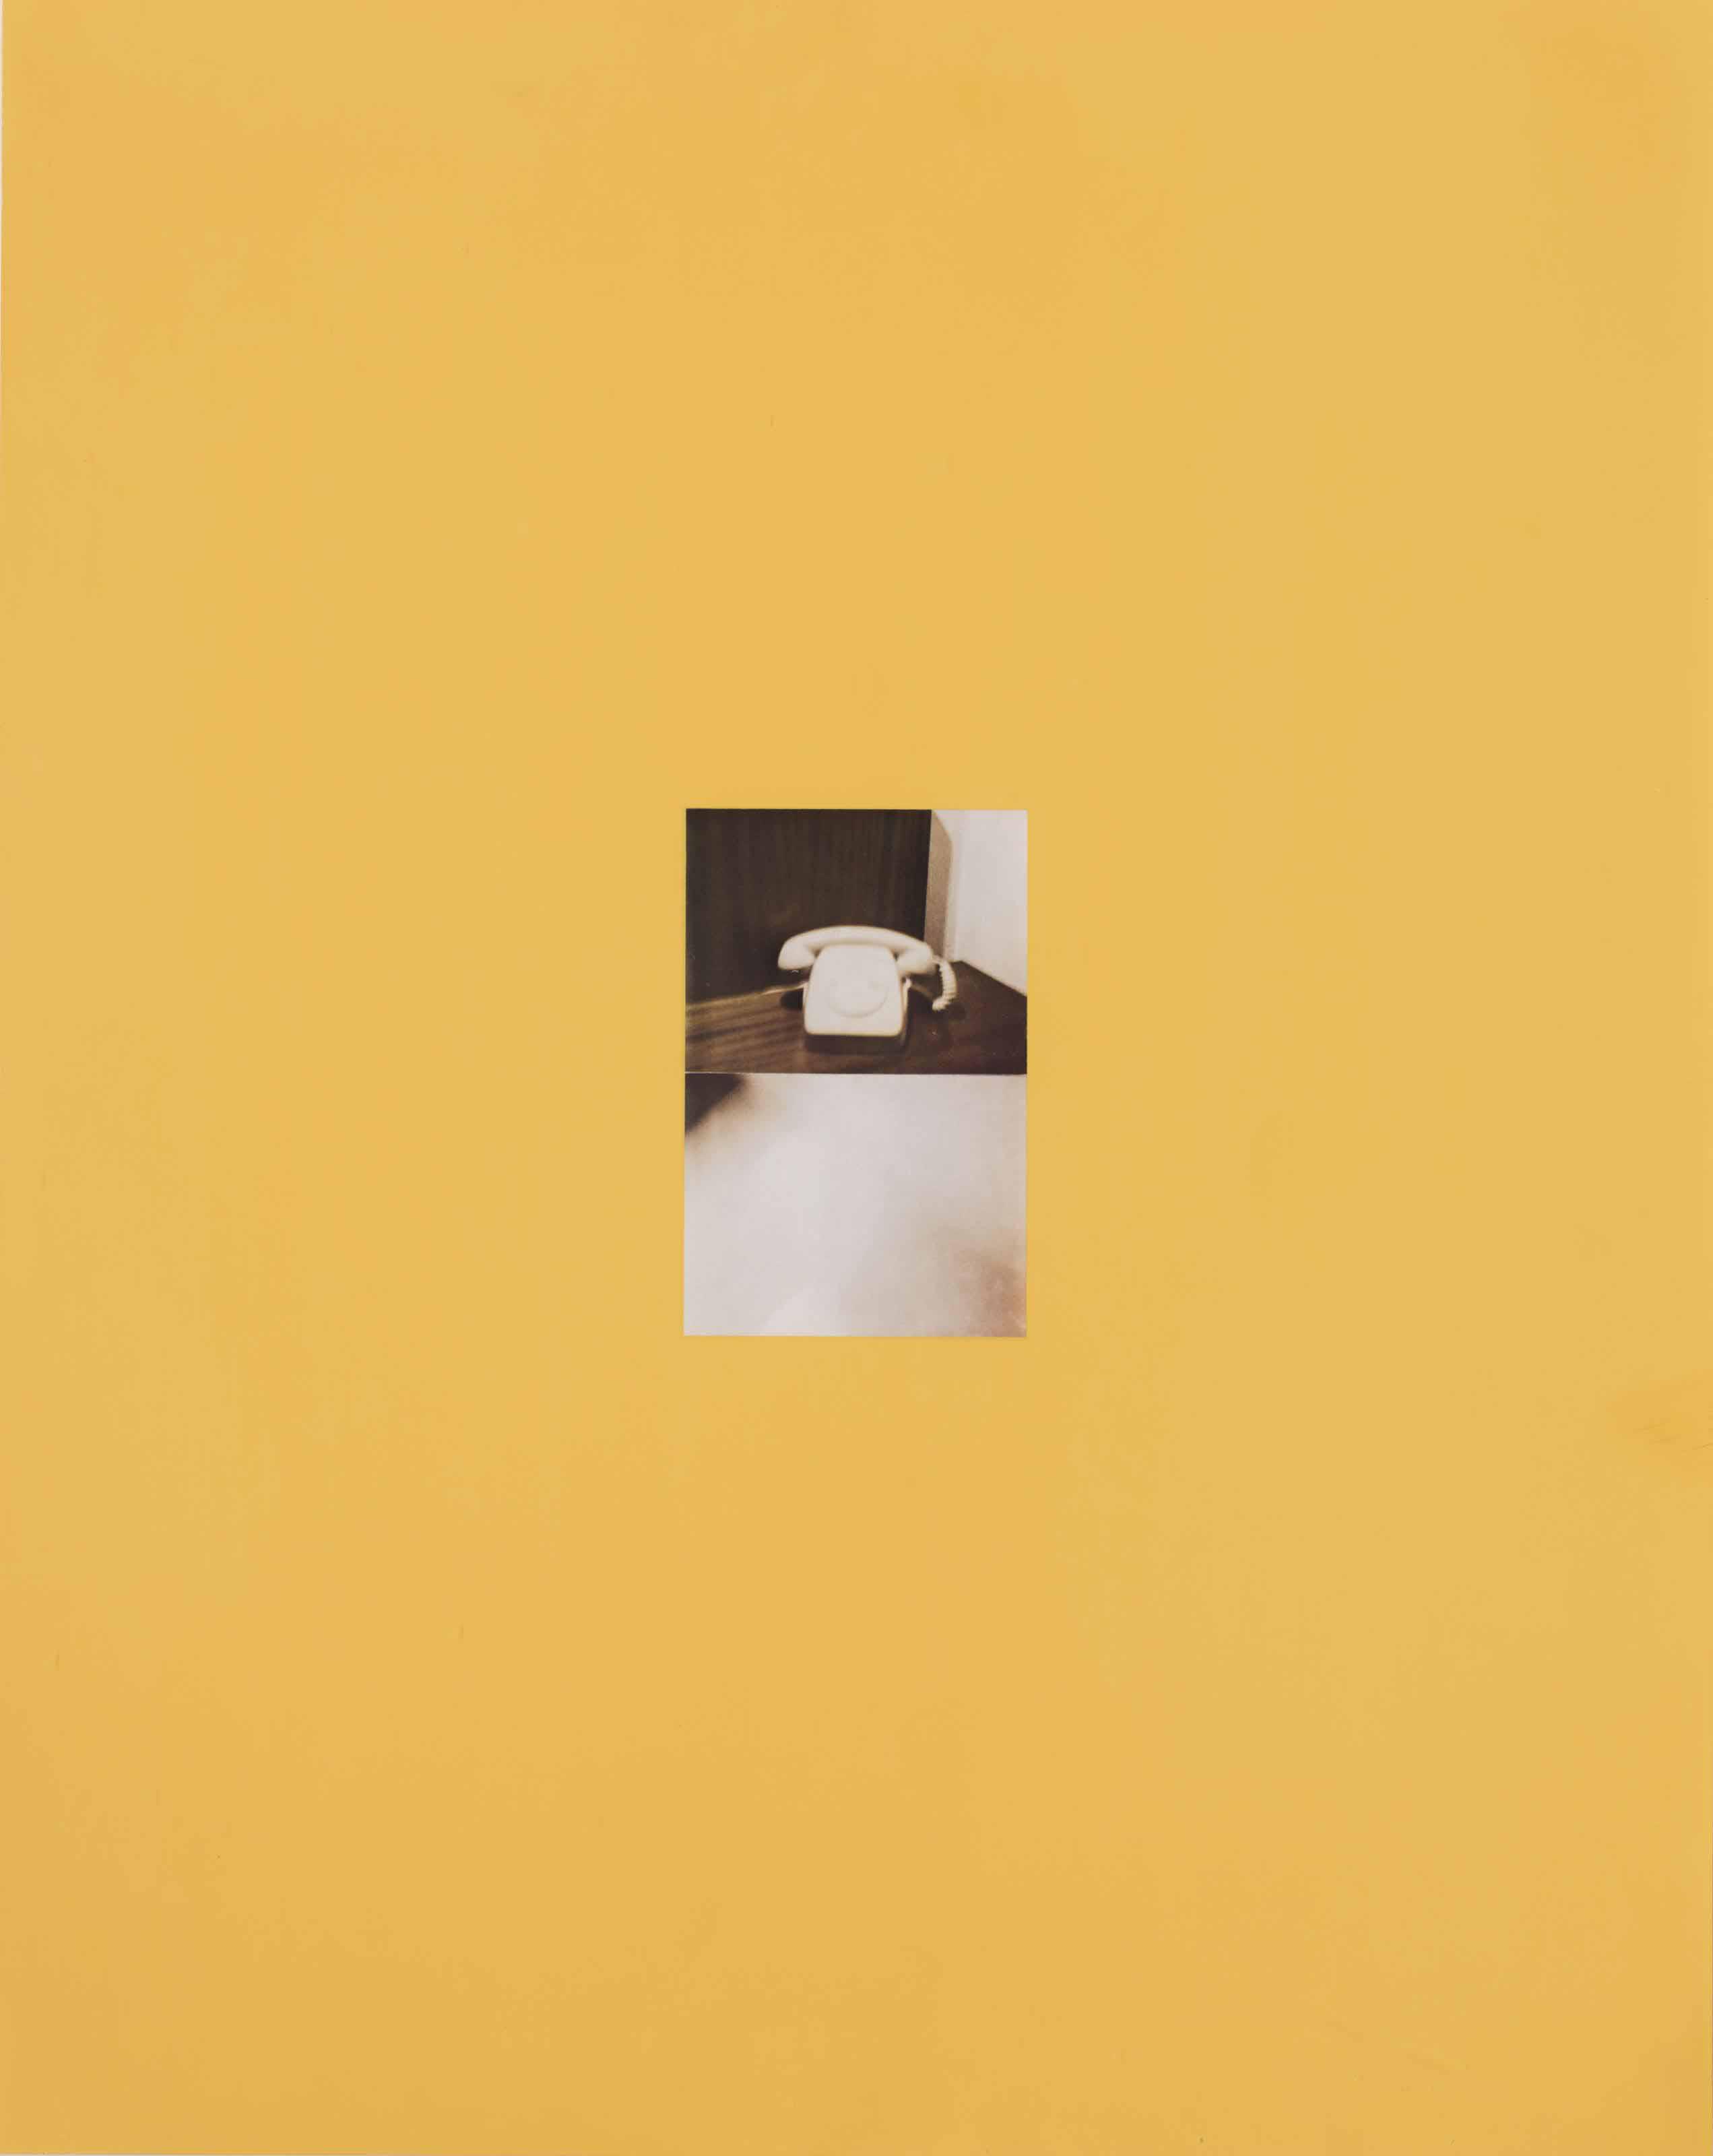 Gerhard Richter (b. 1932) and